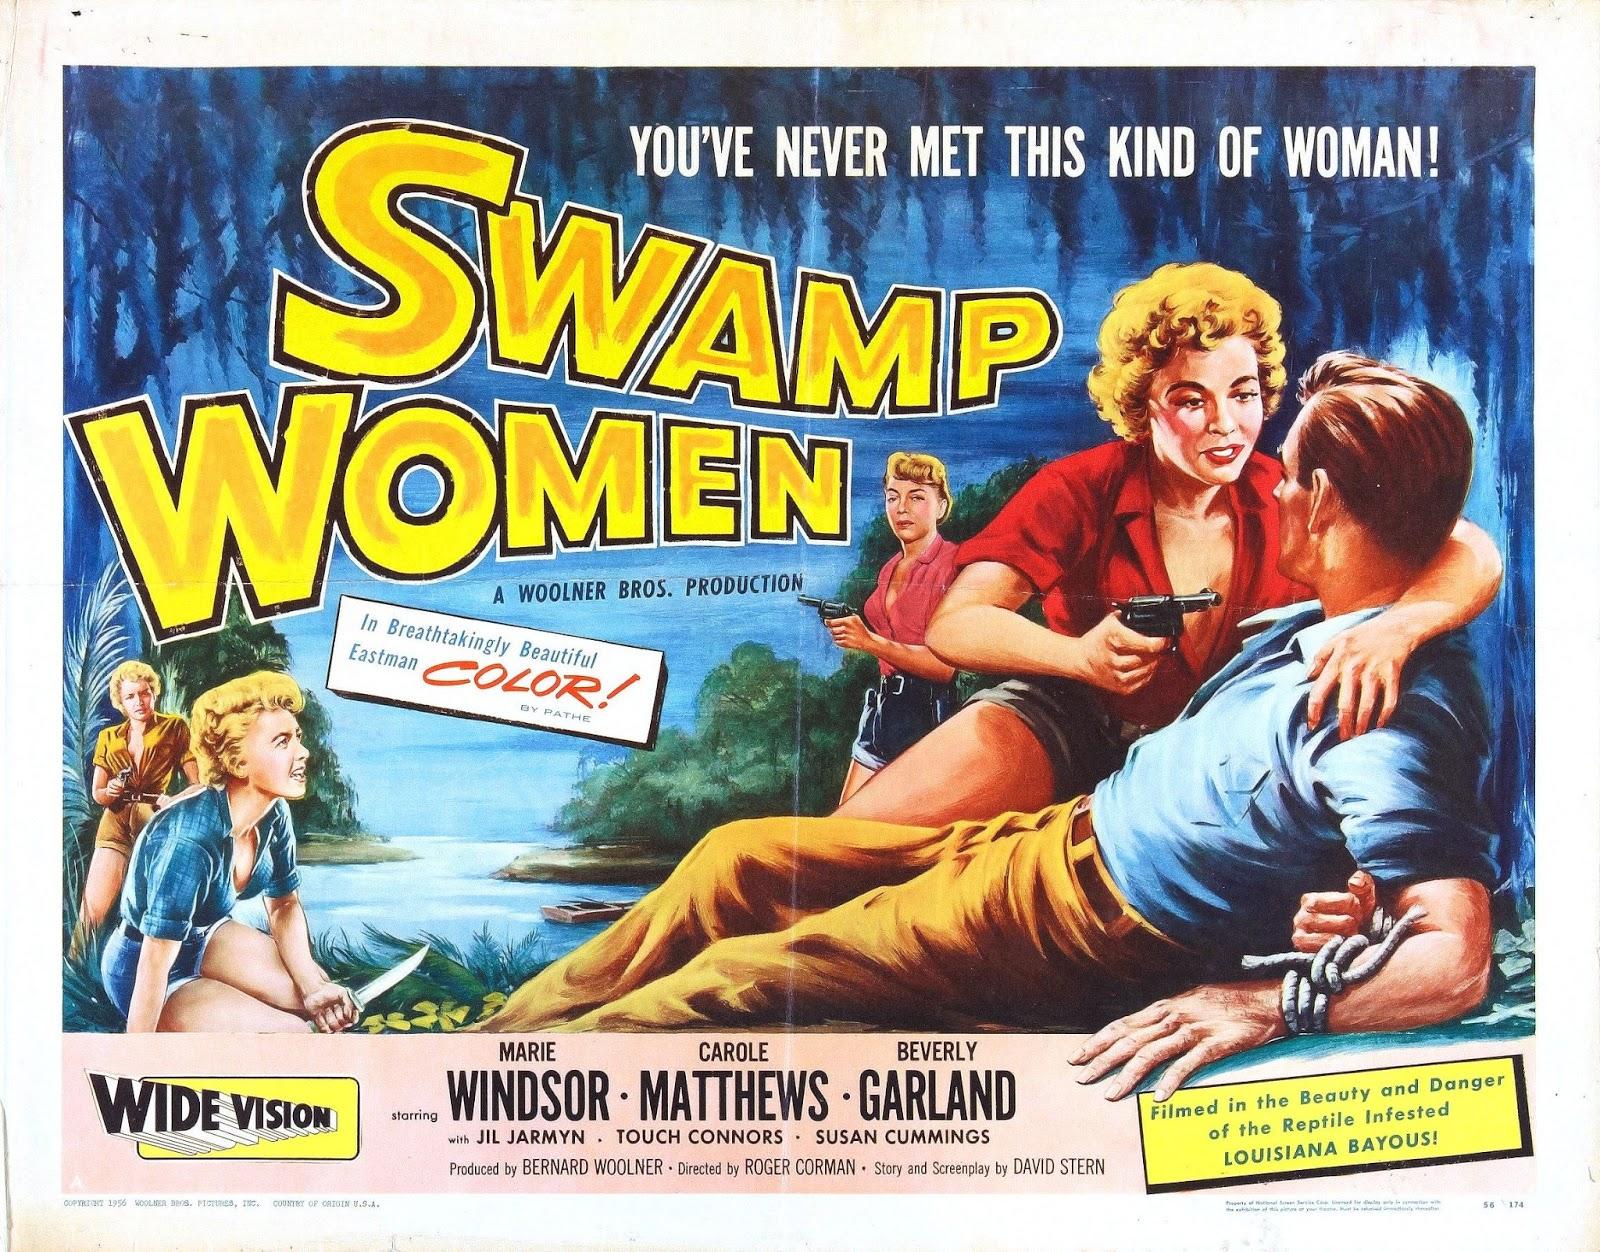 Swamp Women Just Screenshots Swamp Women 1955